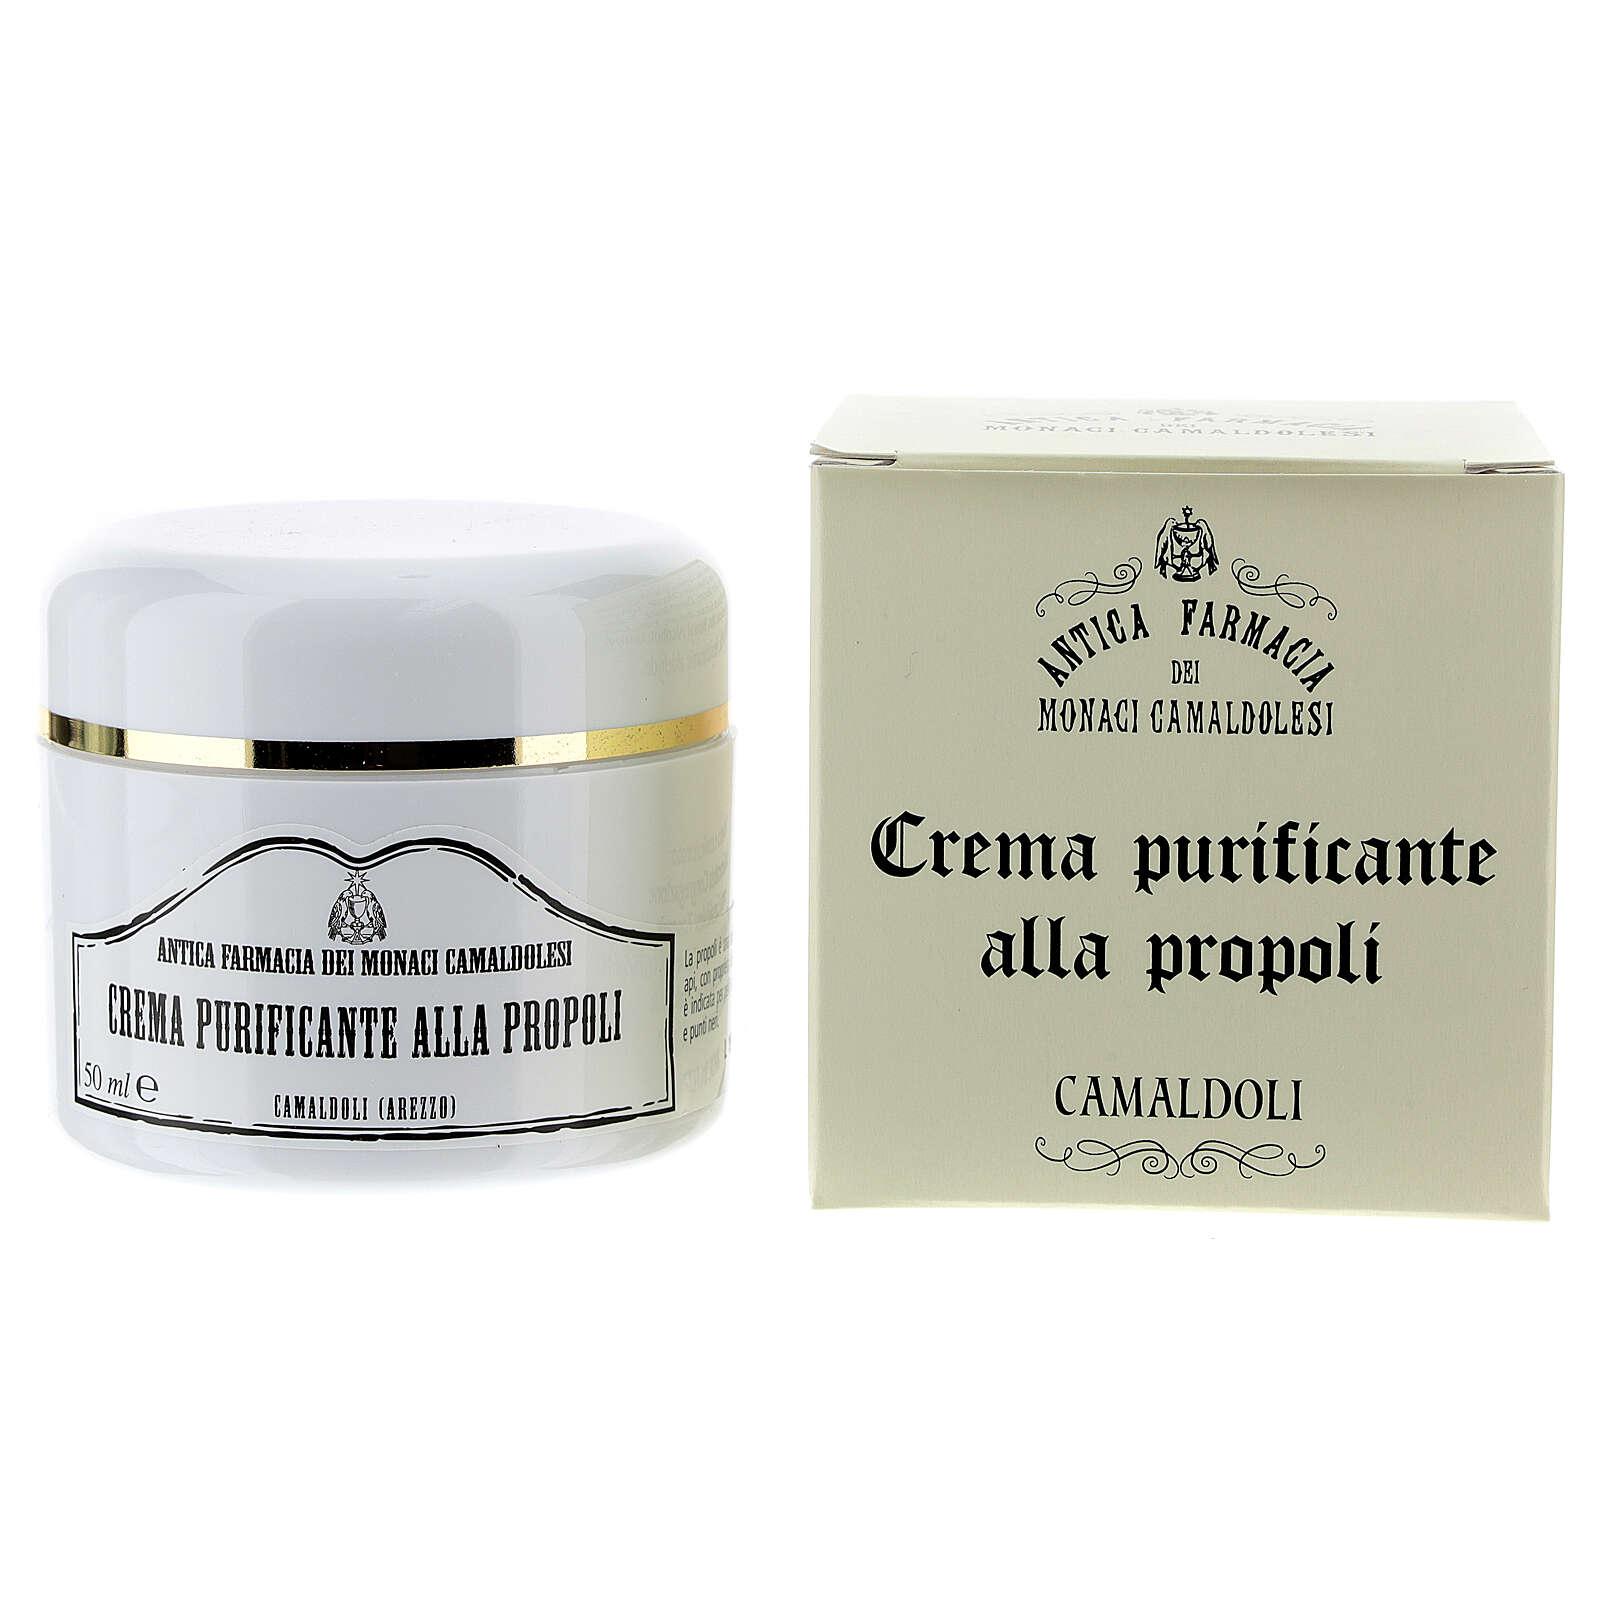 Camaldoli Purifying Bee Propolis Cream (50ml) 4